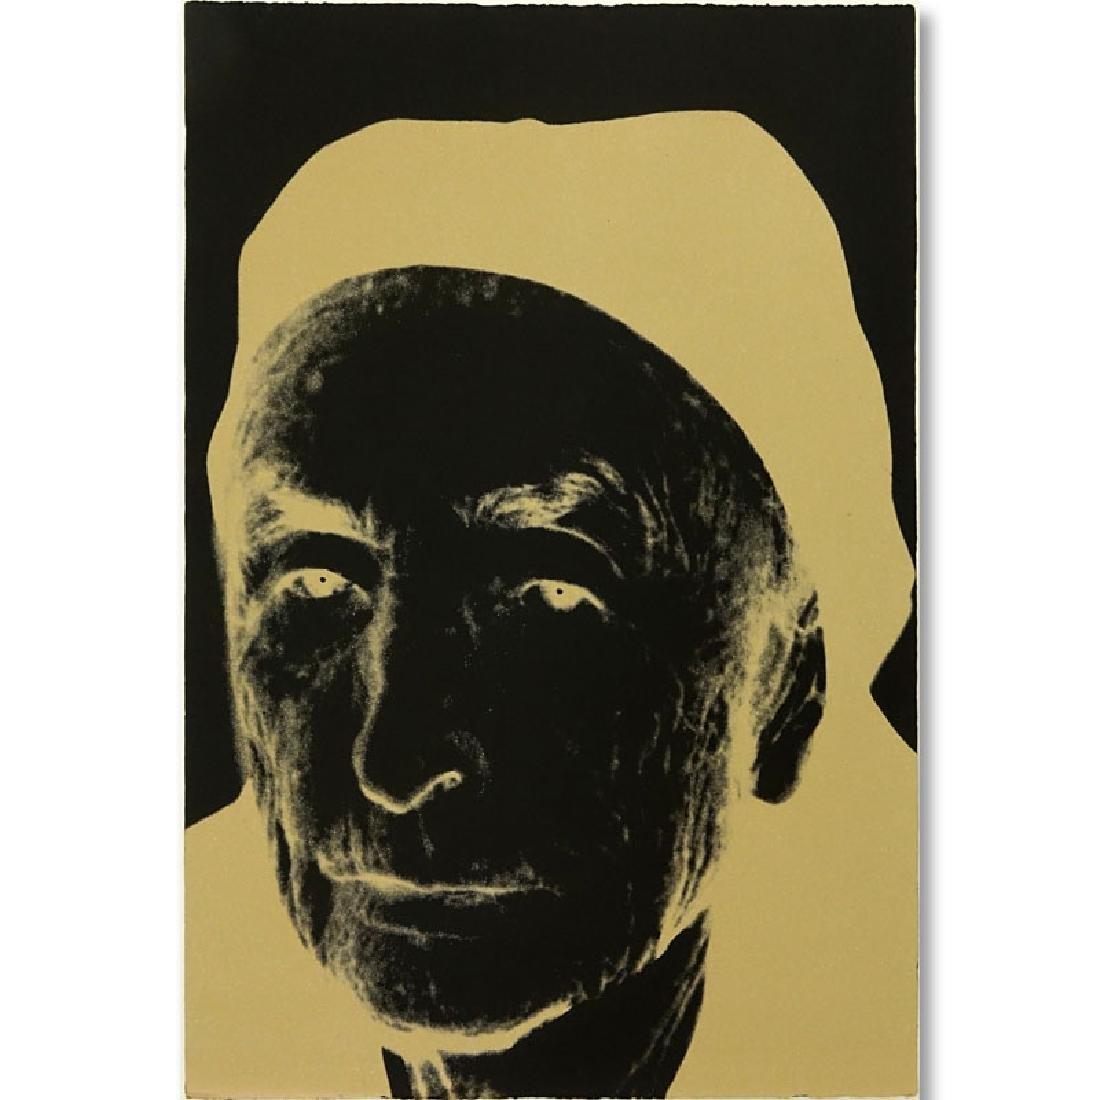 Andy Warhol, American (1928-1987) 1979 Screenprint